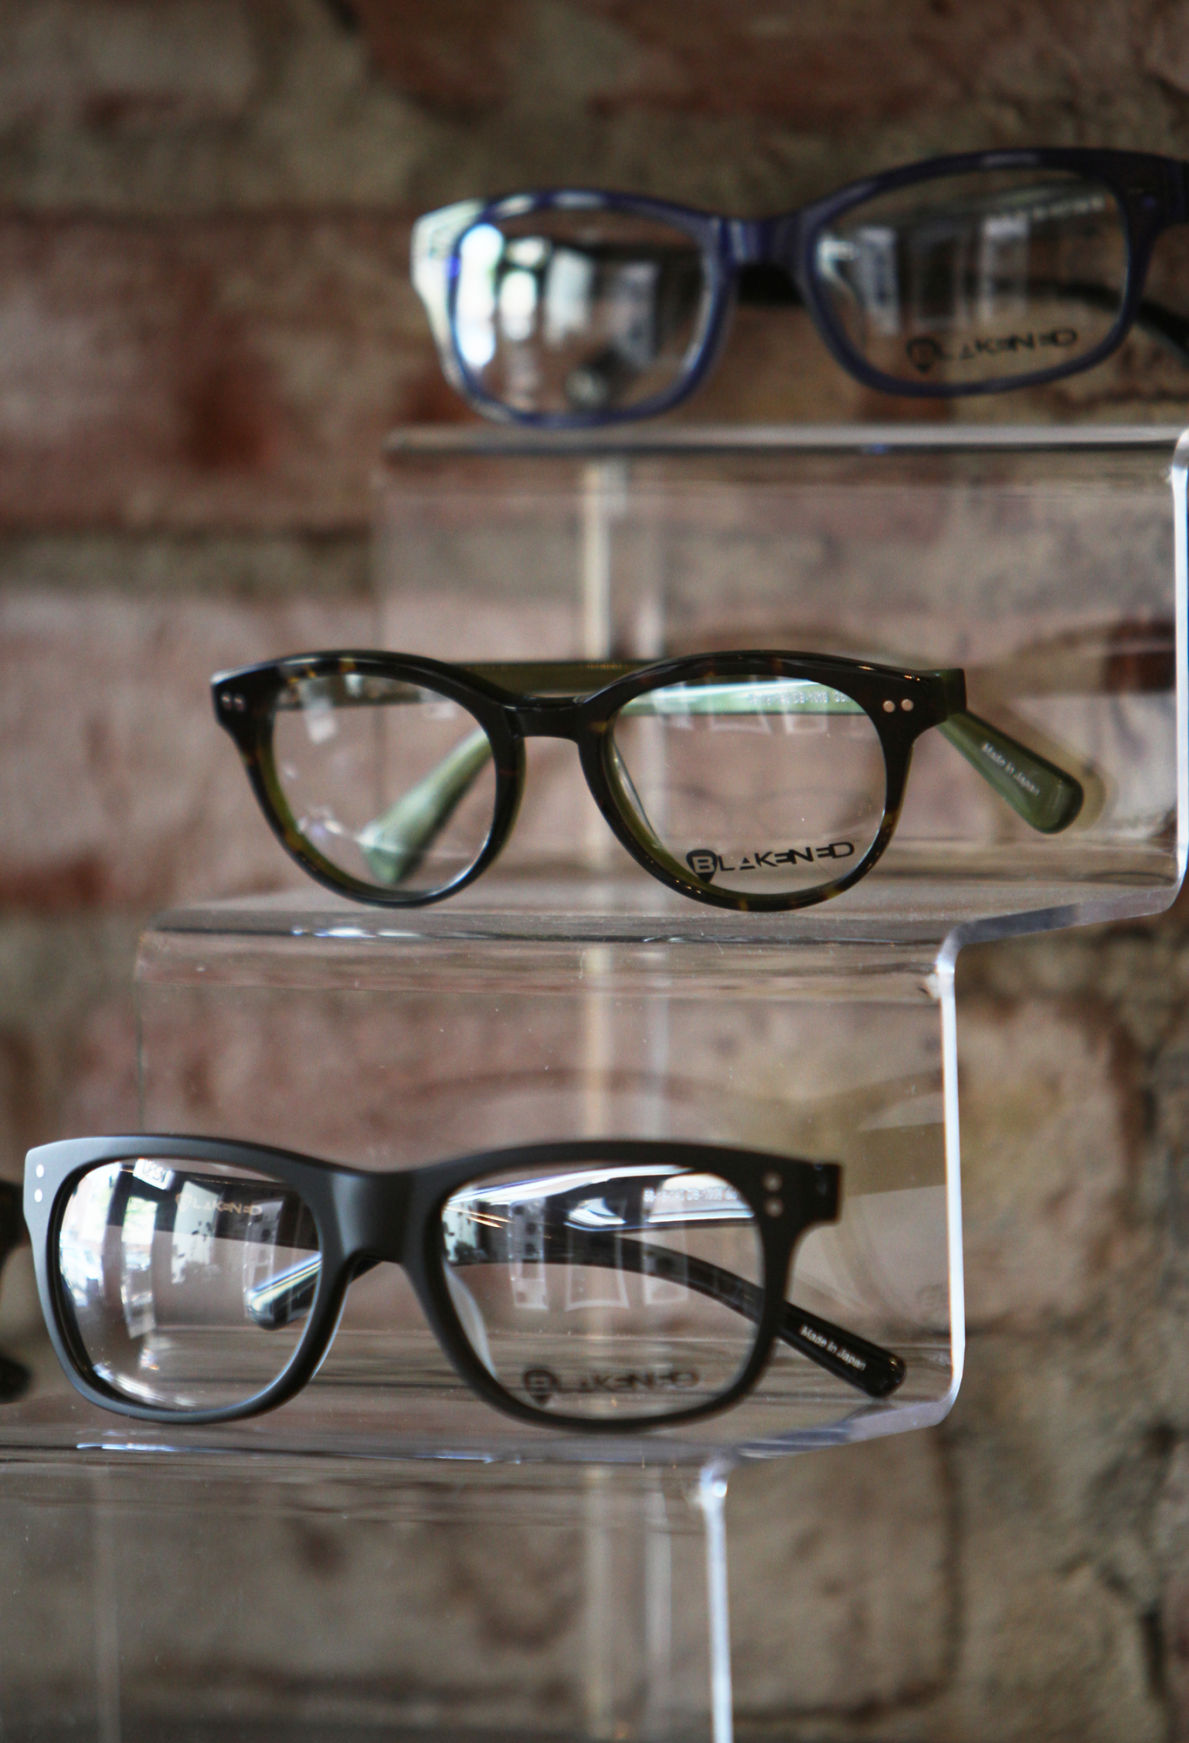 pearl optical meets eye and fashion needs